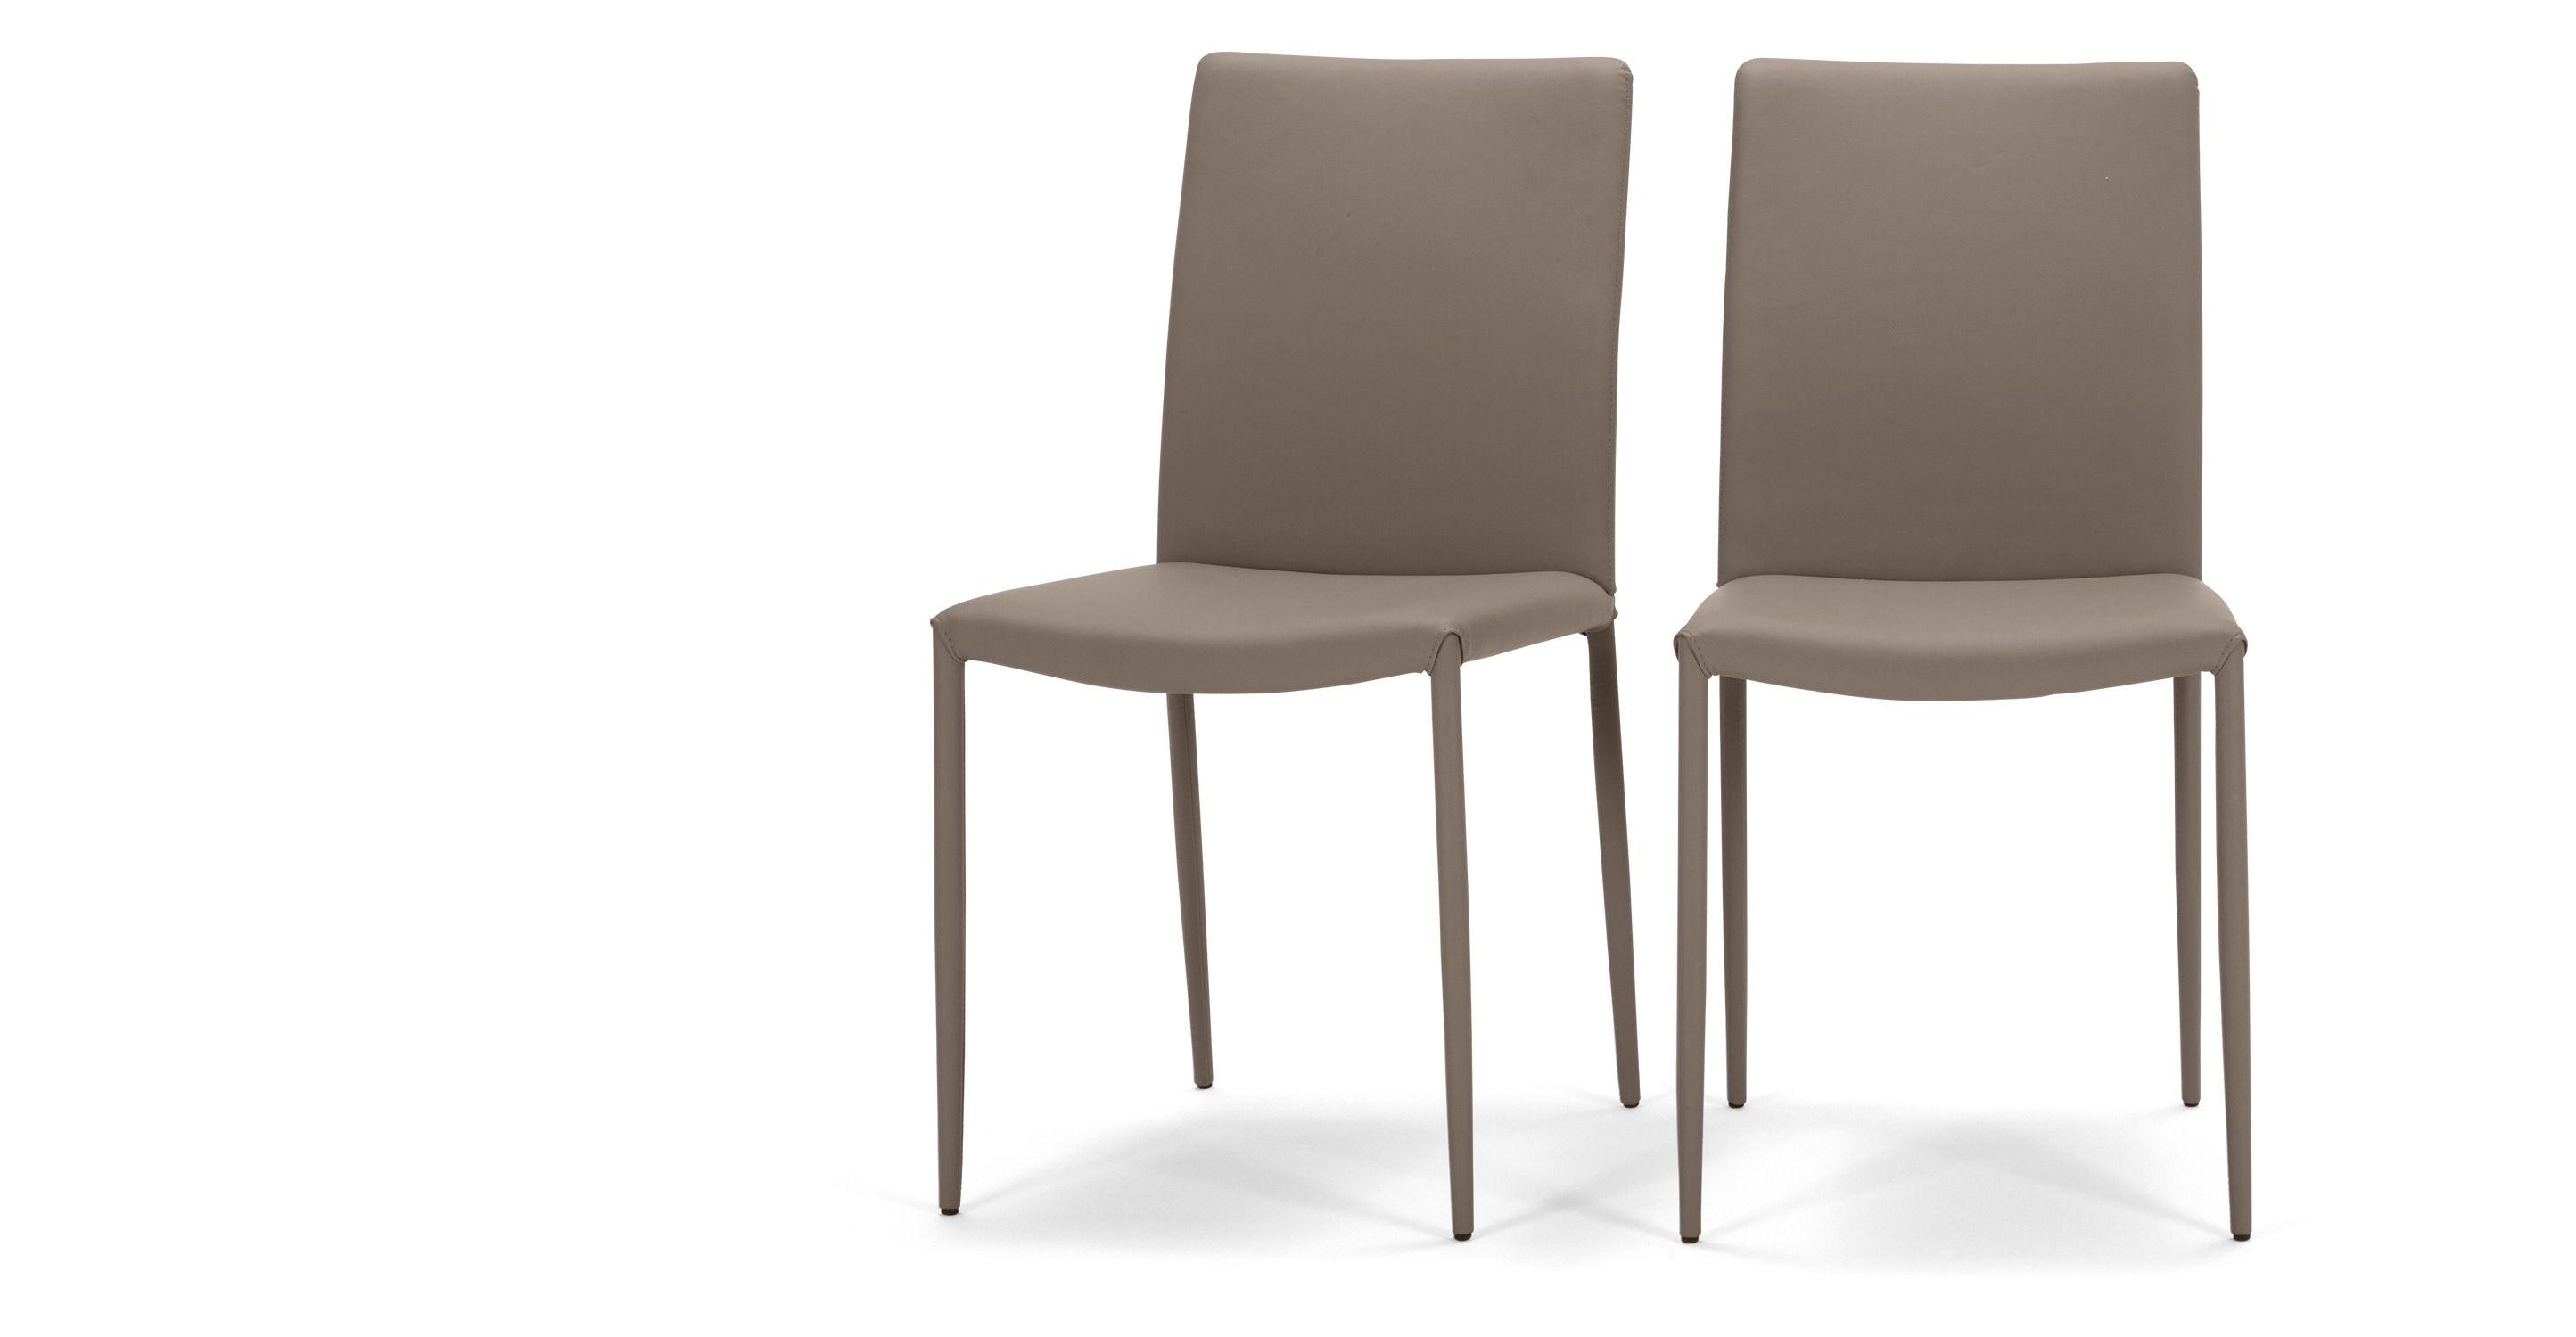 Berühmt John Lewis Küchen Stühle Galerie - Küche Set Ideen ...